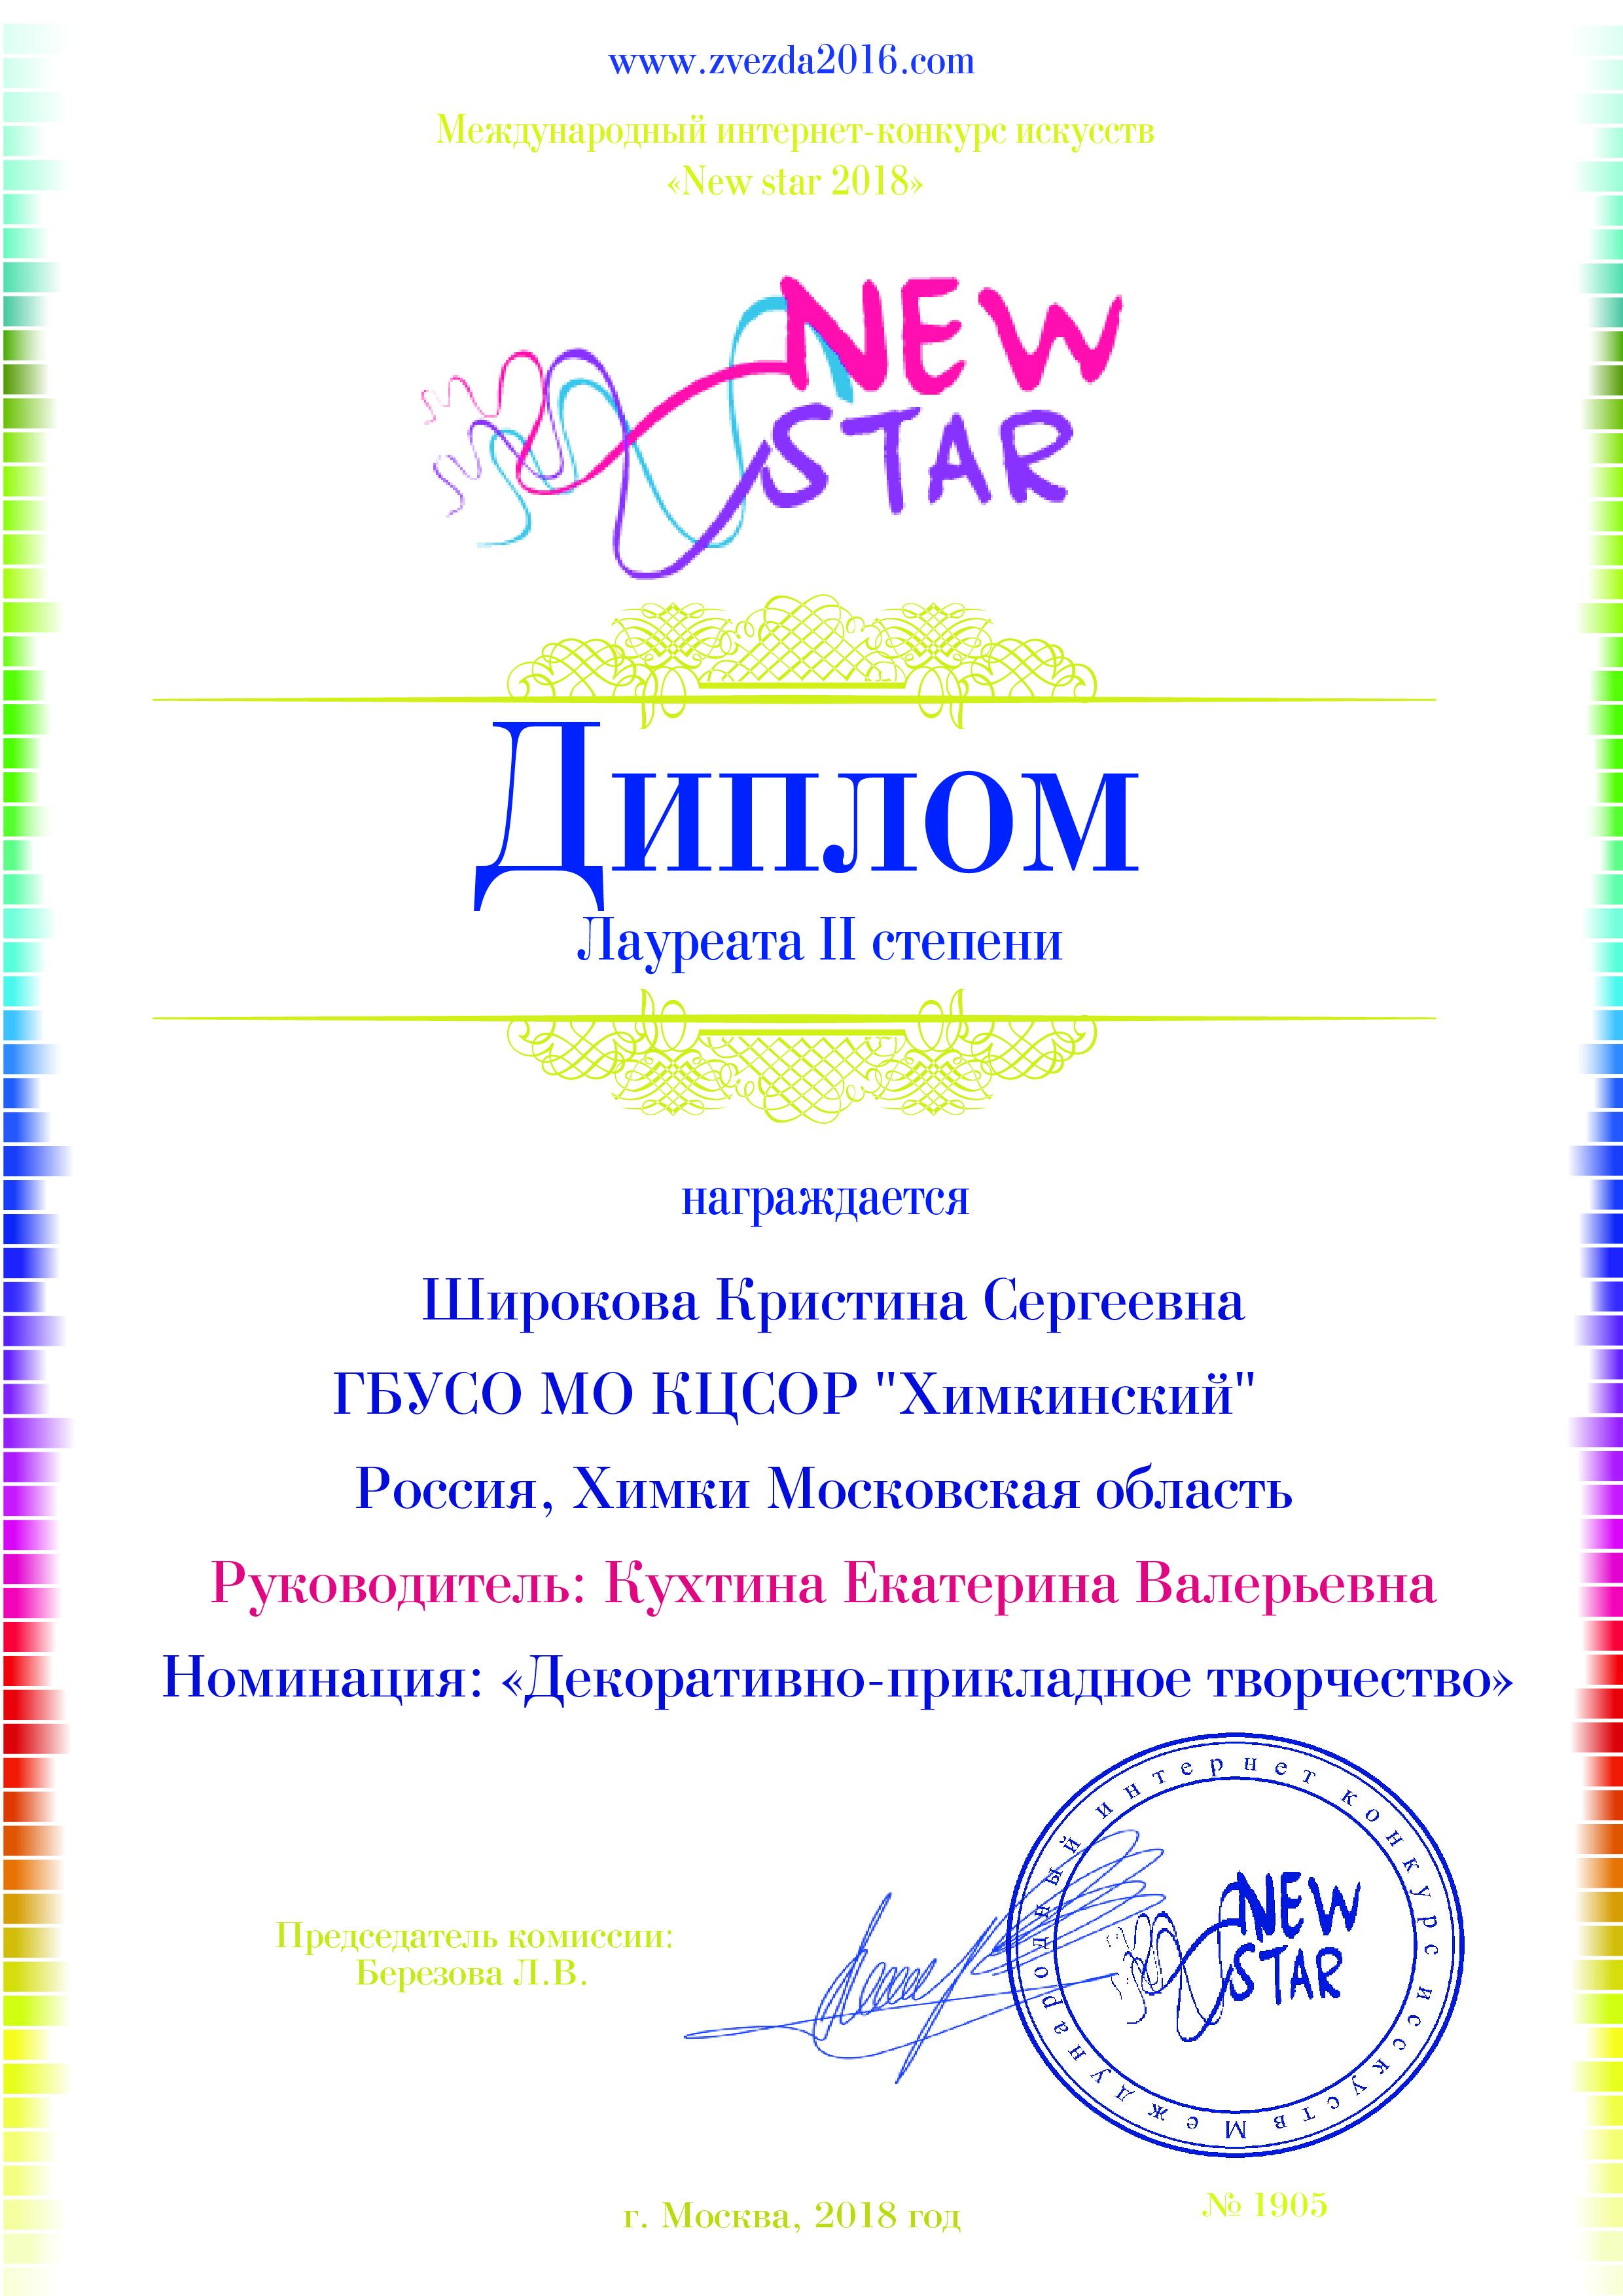 "Диплом Лауреата II степени Международного интернет-конкурса искусств ""New star 2018"""